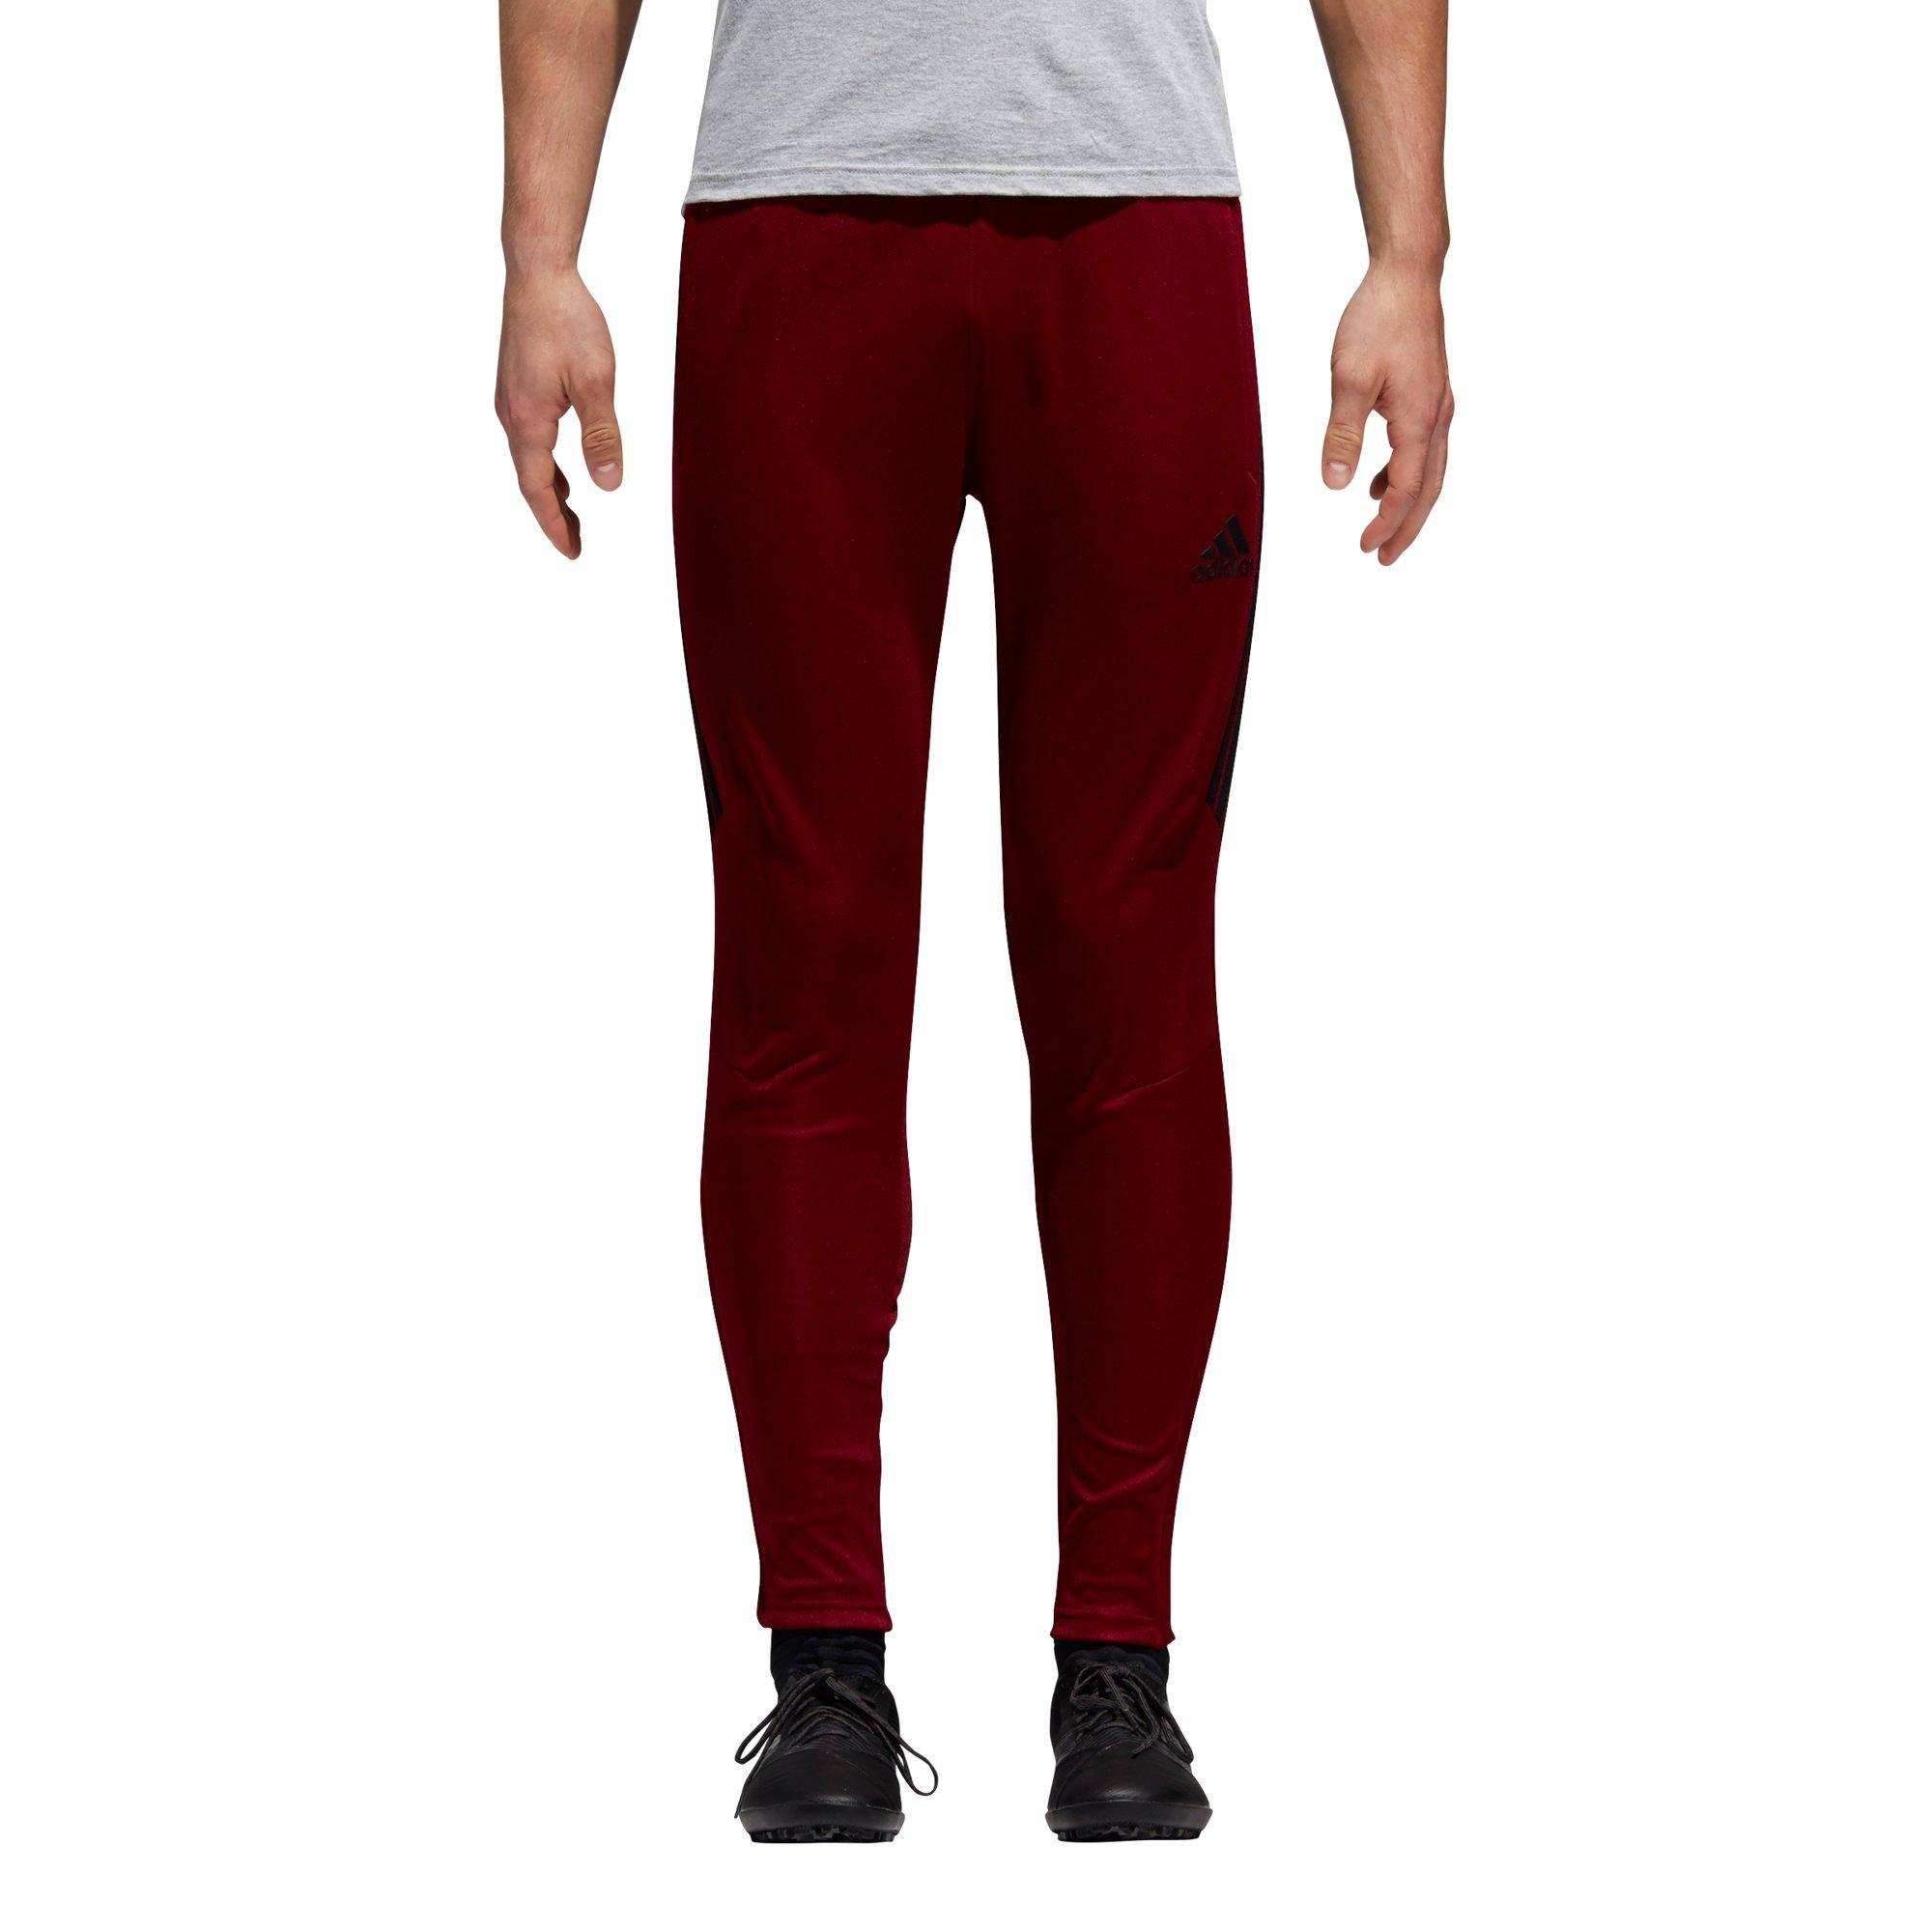 Adidas Soccer 17 Entrenamiento Pantalones Men's Tiro De rBqxAwr5W